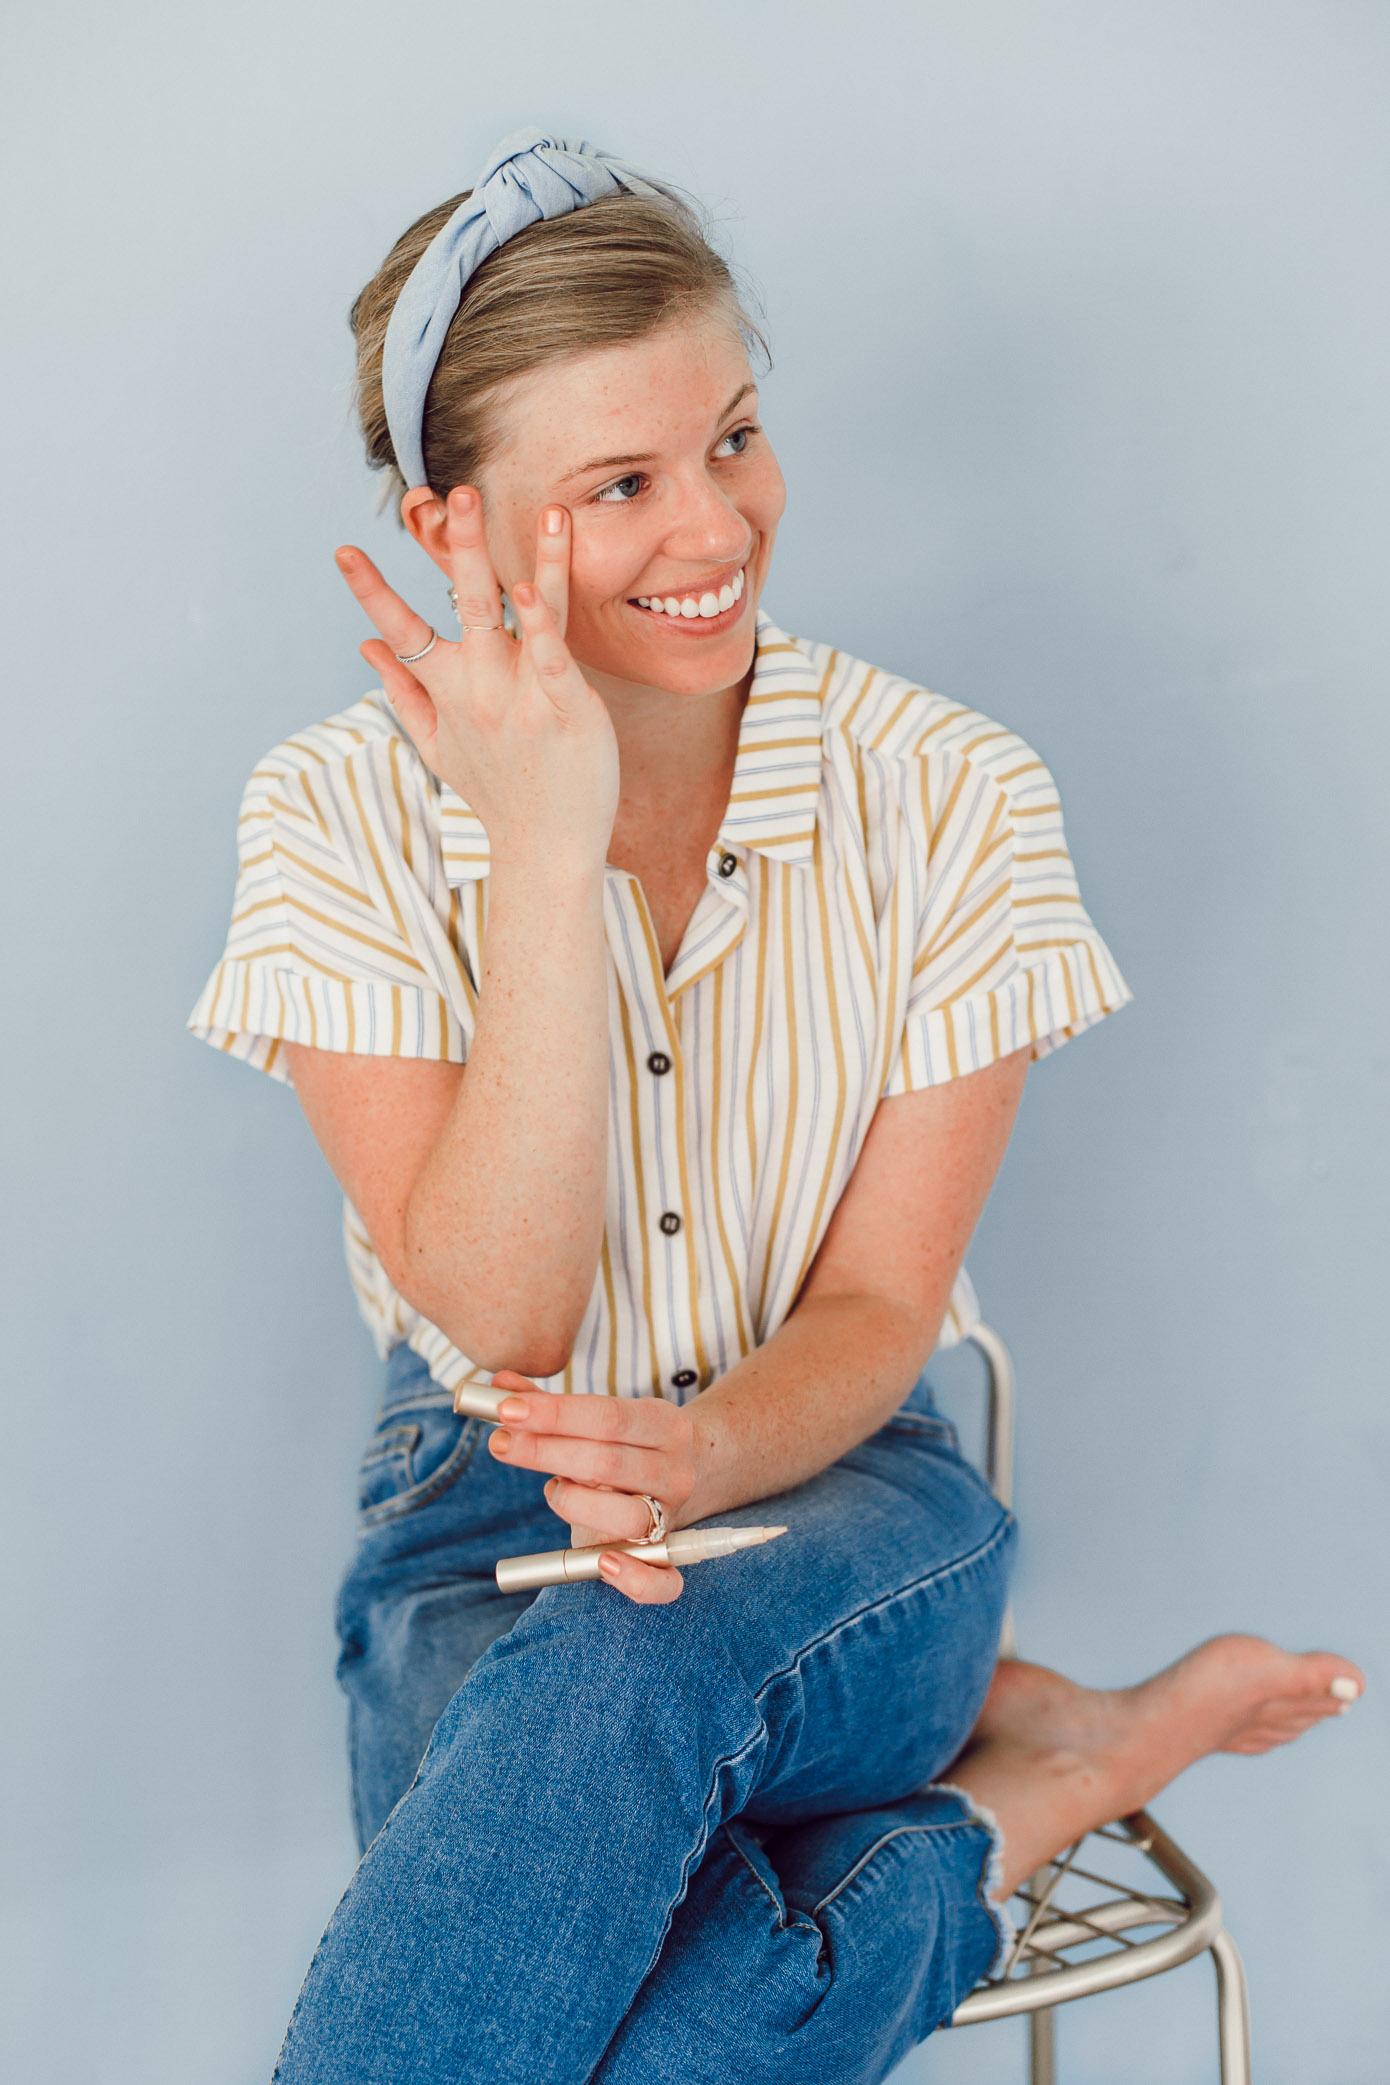 Clean Under-eye Concealer | Clean Beauty, Clean Make-up | Louella Reese